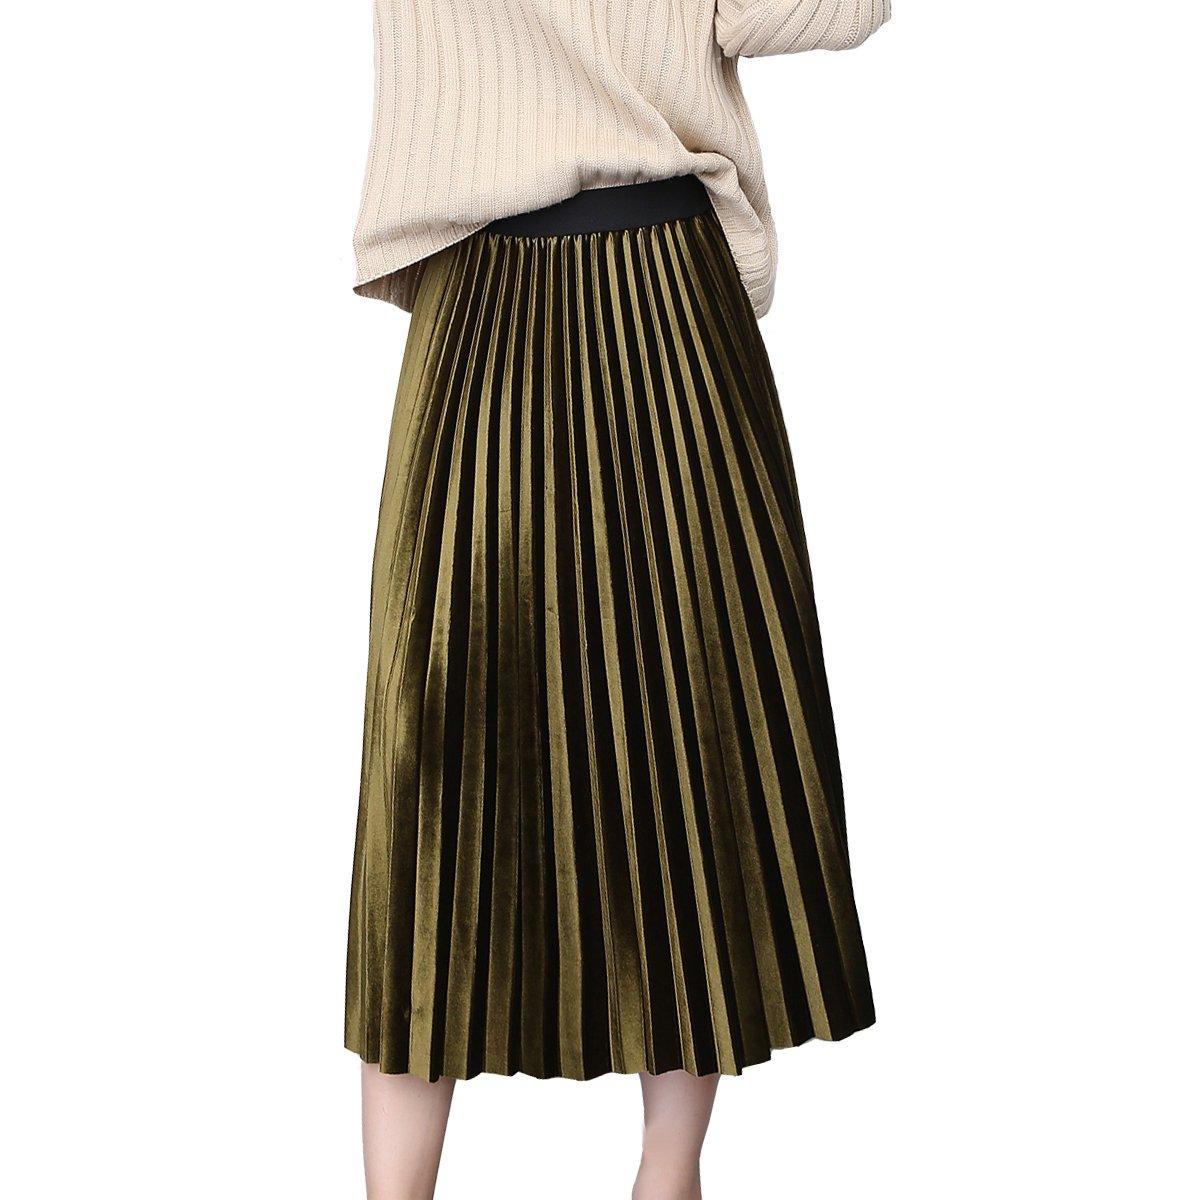 Nadalan Women Velvet A Line Vintage High Elastic Waist Pleated Fashion Long Skirt (Free Size, Dark Green)